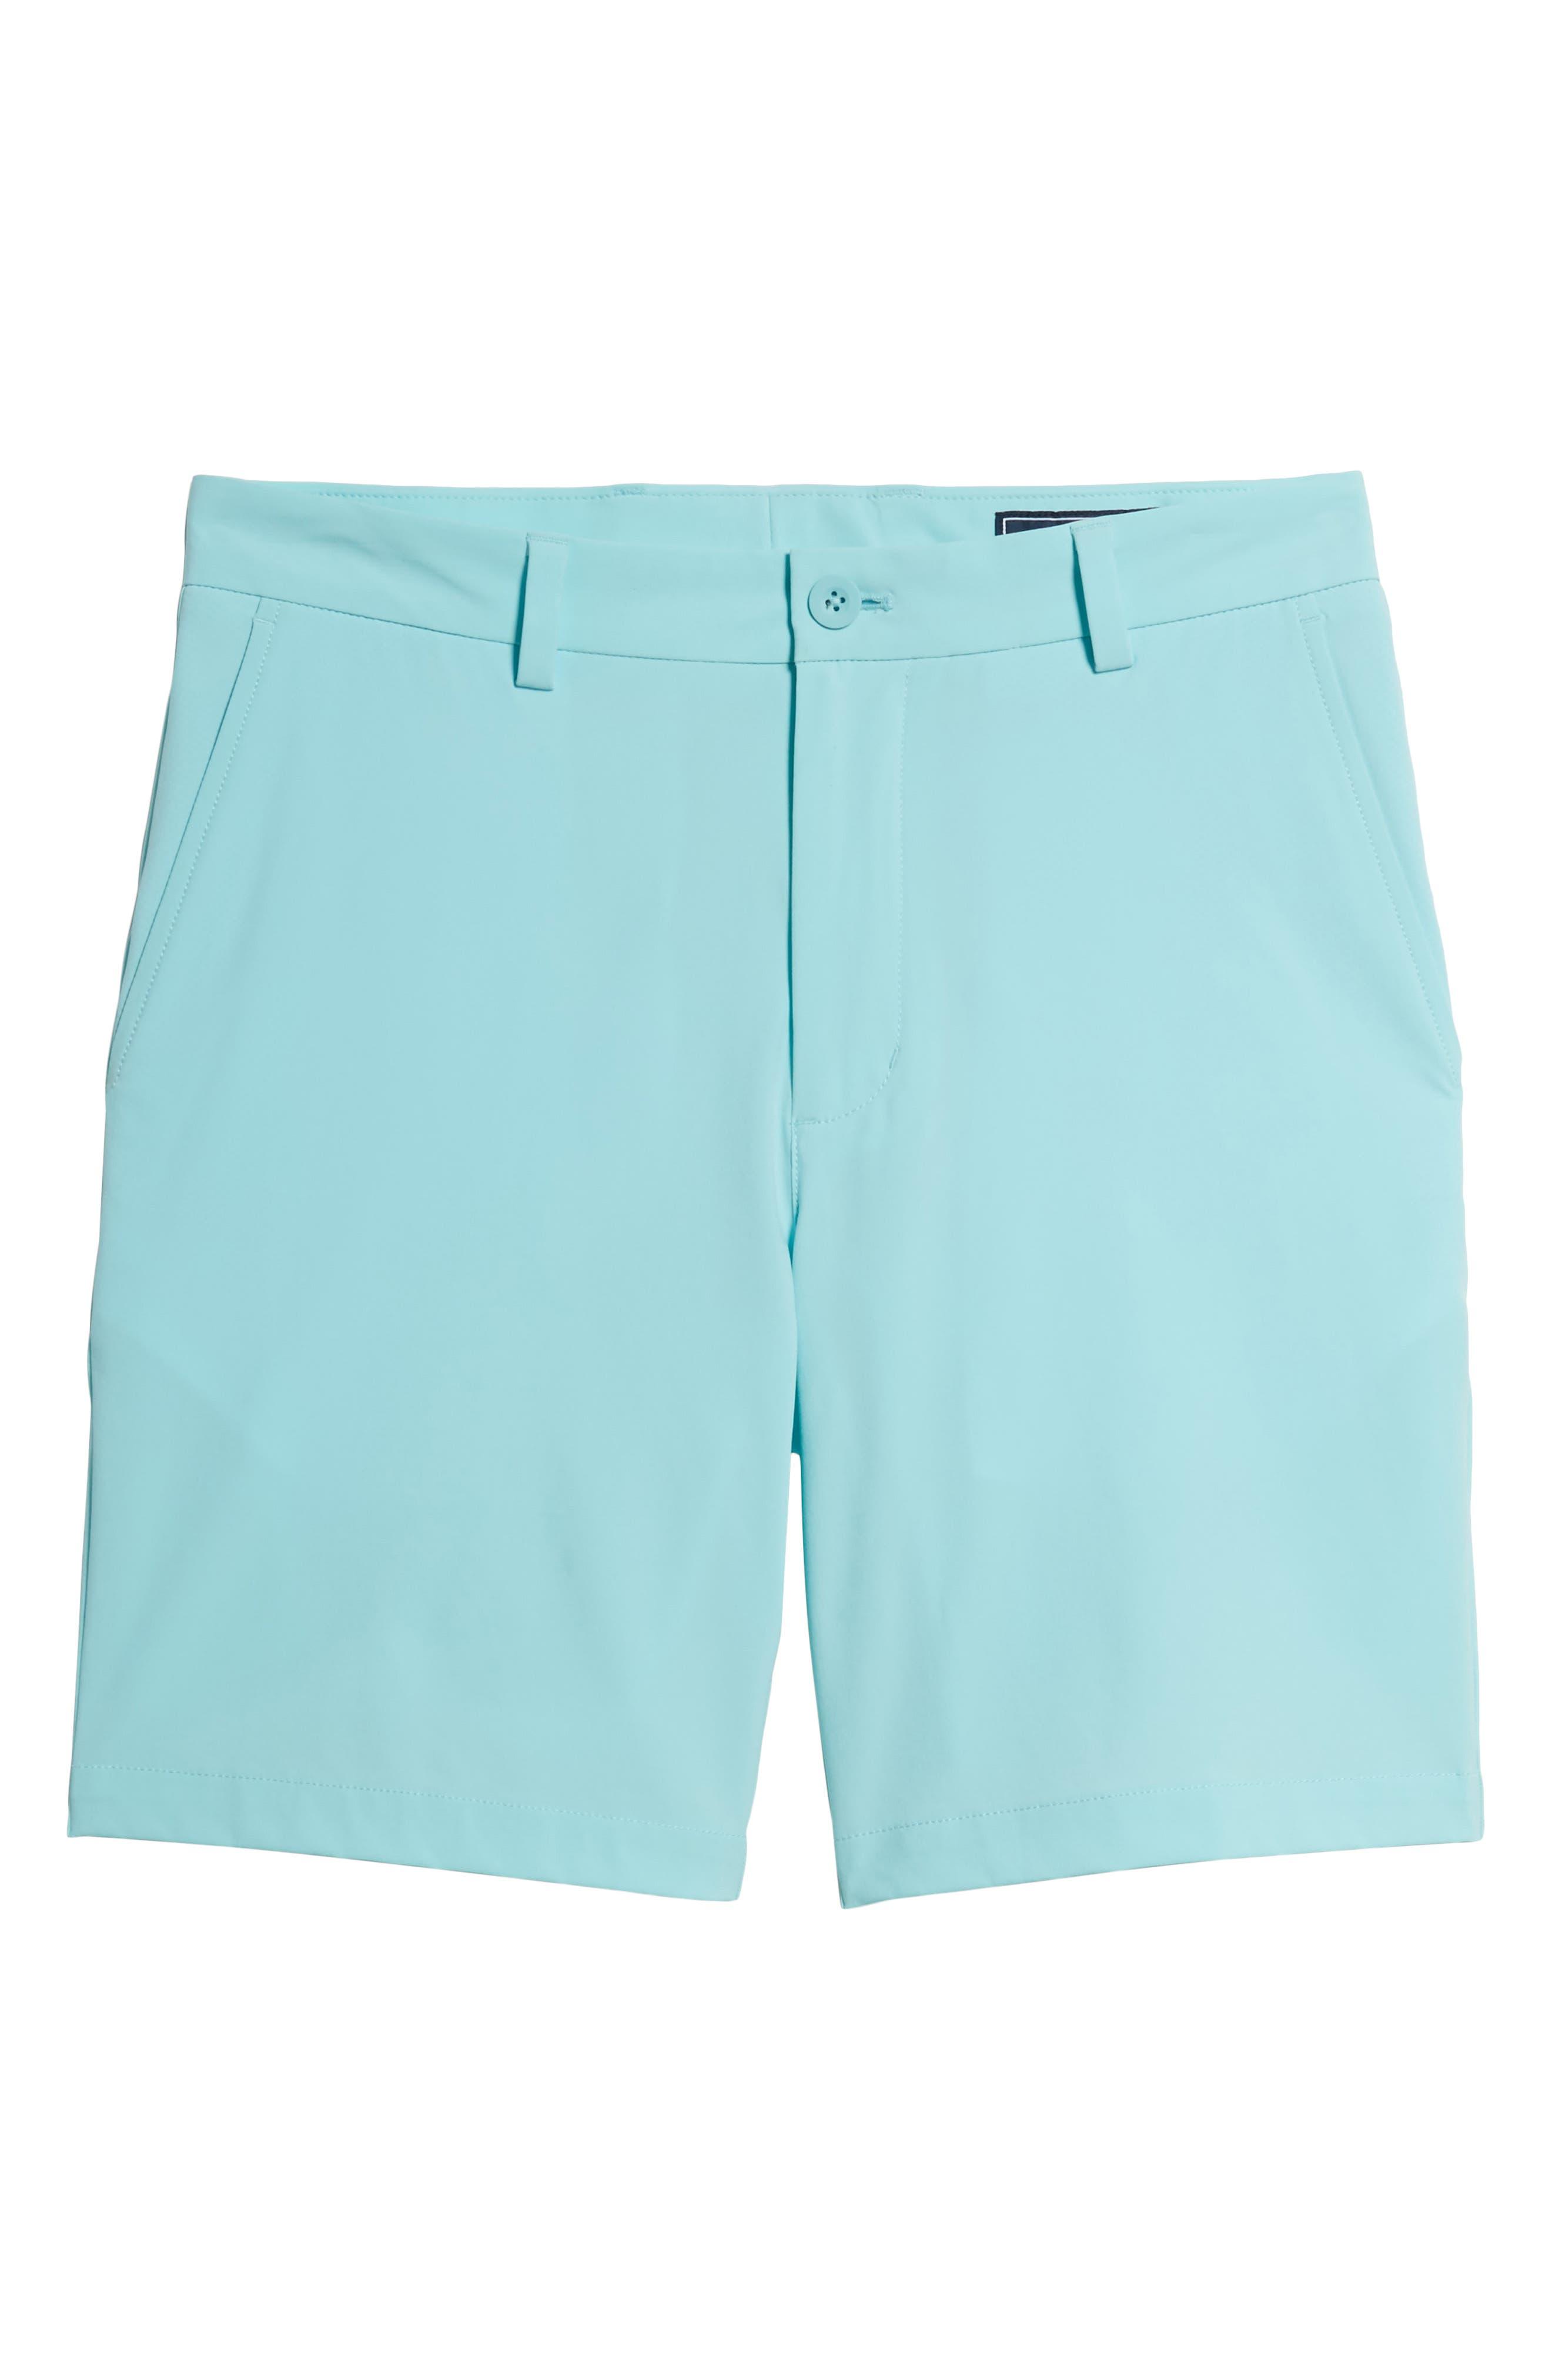 8 Inch Performance Breaker Shorts,                             Alternate thumbnail 76, color,